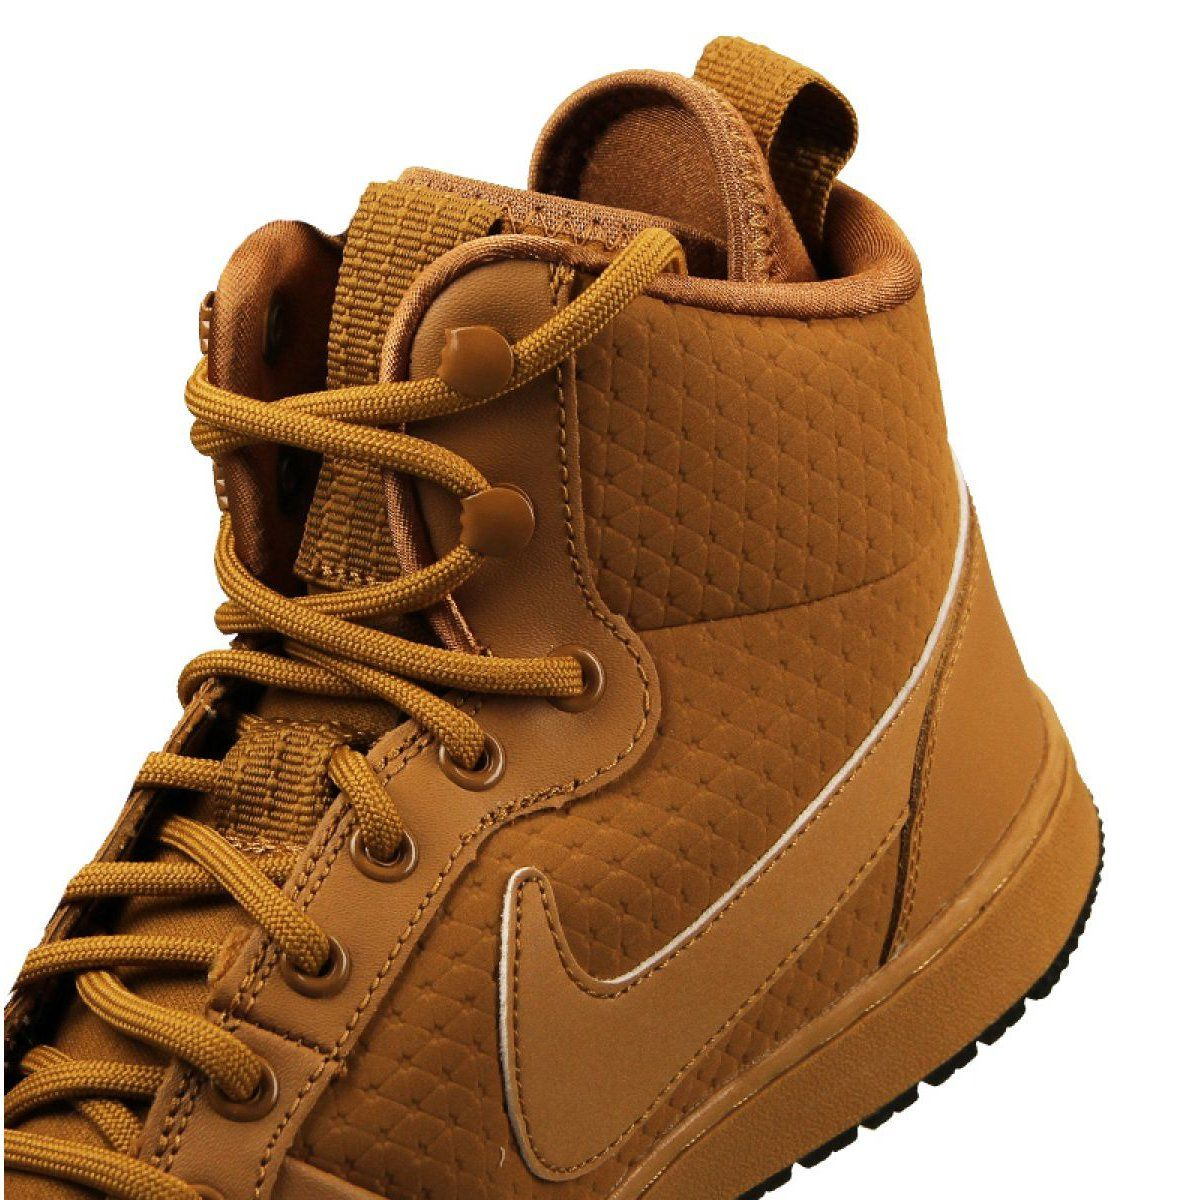 Buty Nike Ebernon Mid Winter M Aq8754 700 Brazowe Shoes Mens Nike Shoes Nike